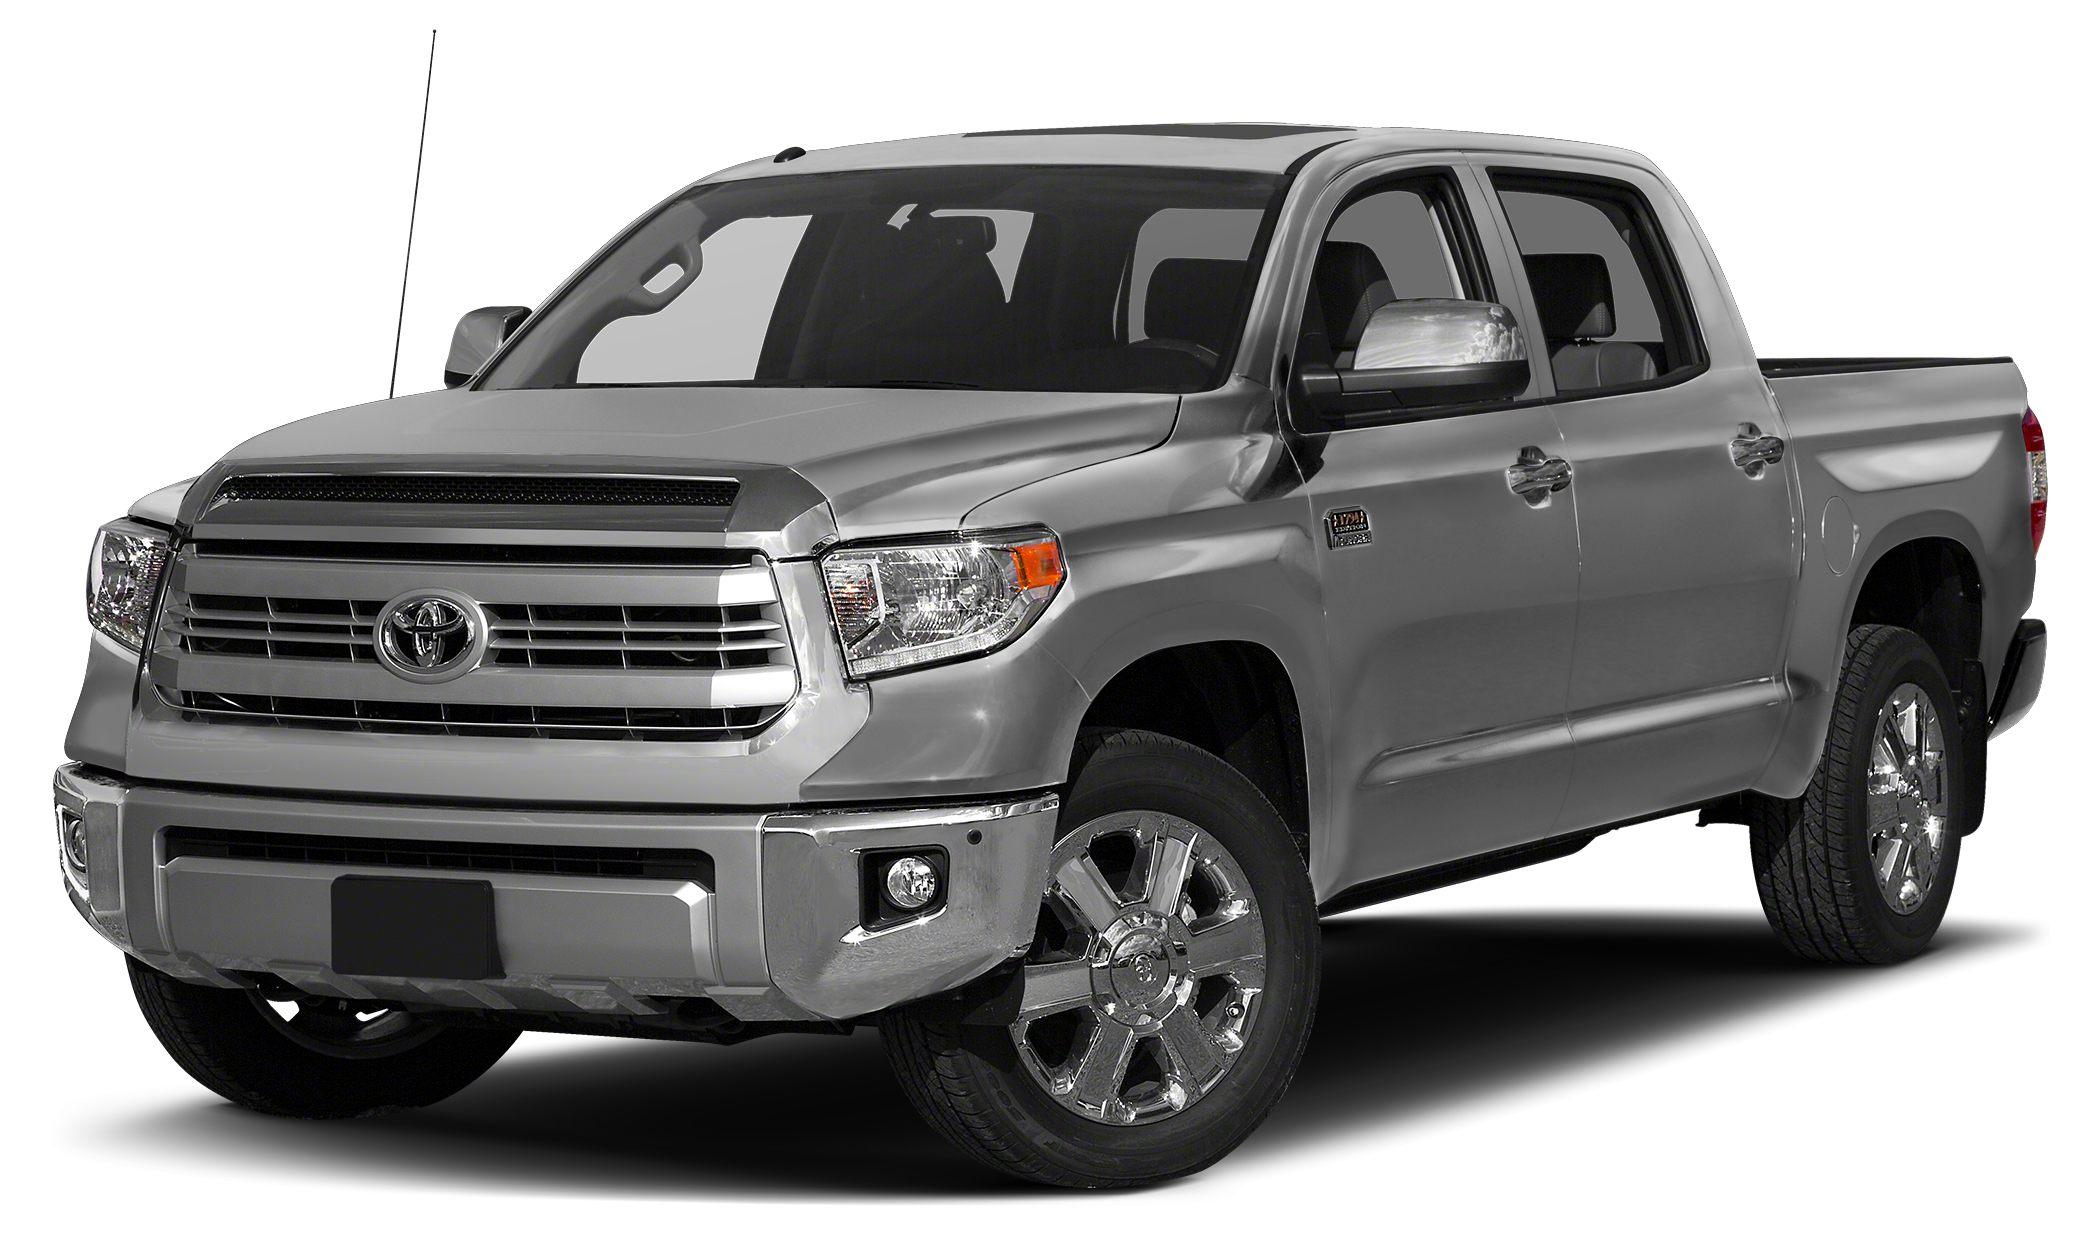 2016 Toyota Tundra 1794 Miles 0Color Silver Sky Metallic Stock 04271 VIN 5TFGW5F13GX204271